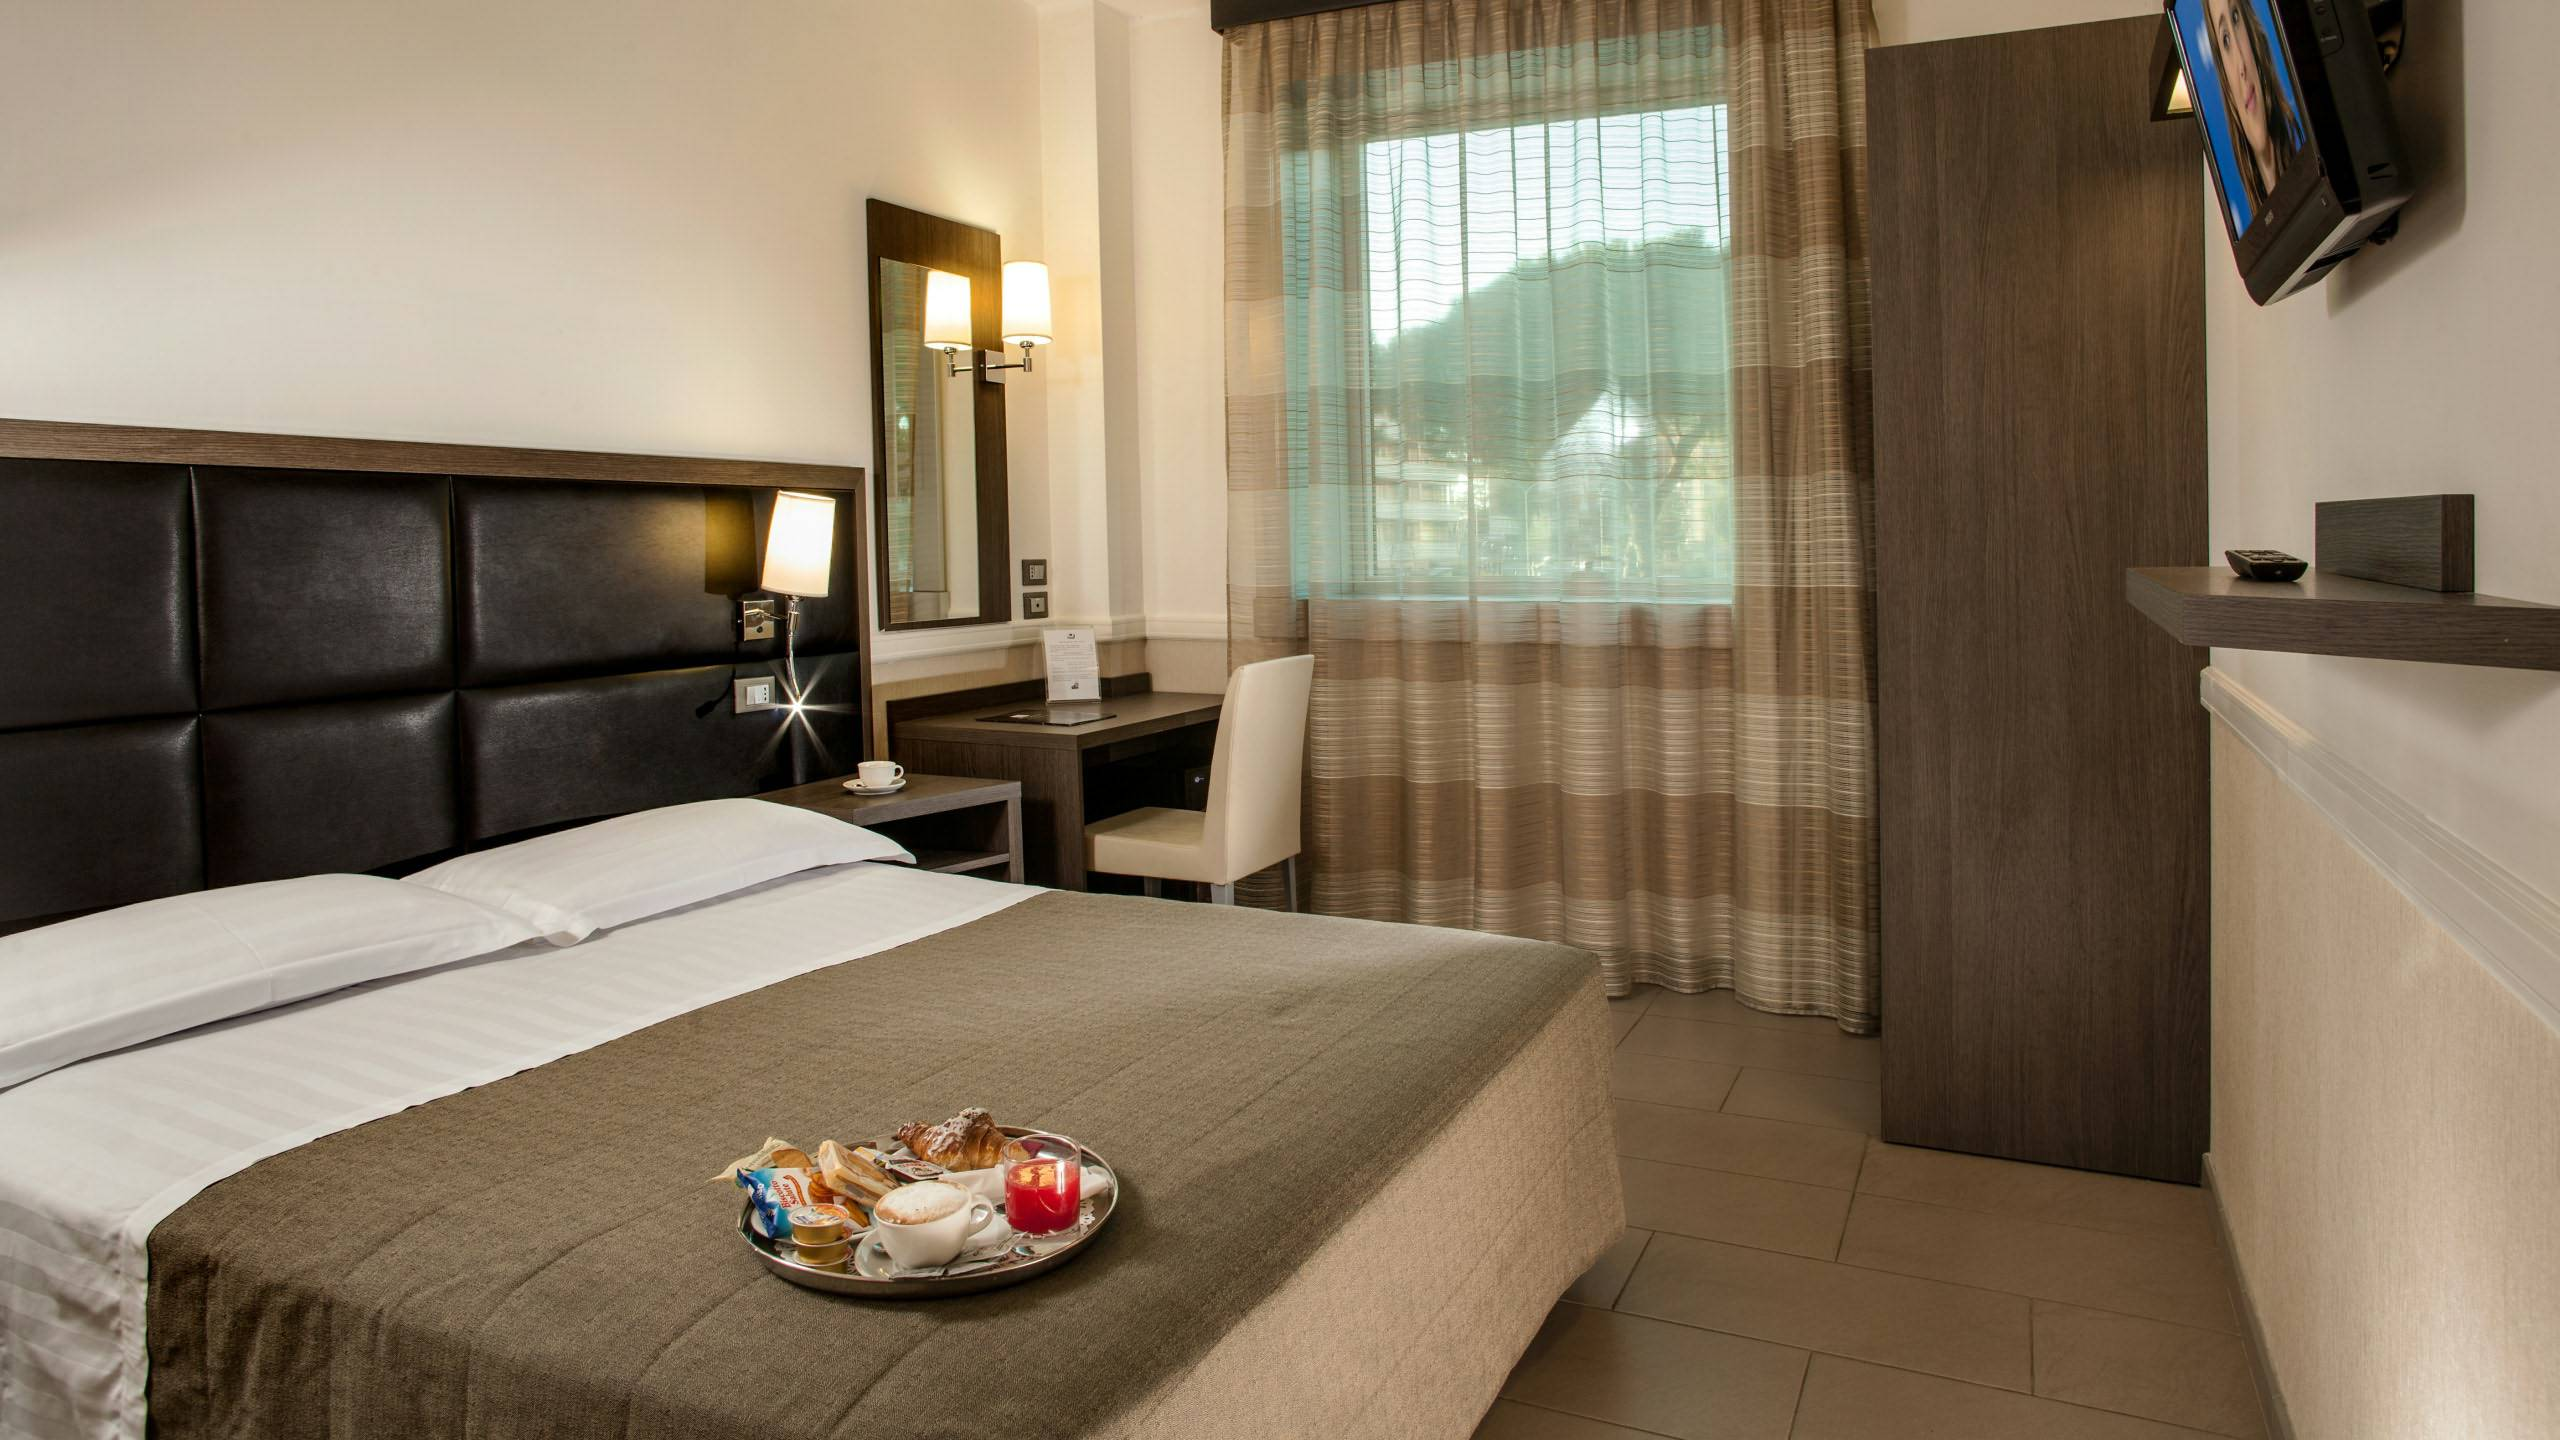 hotel-artis-roma-camere-04